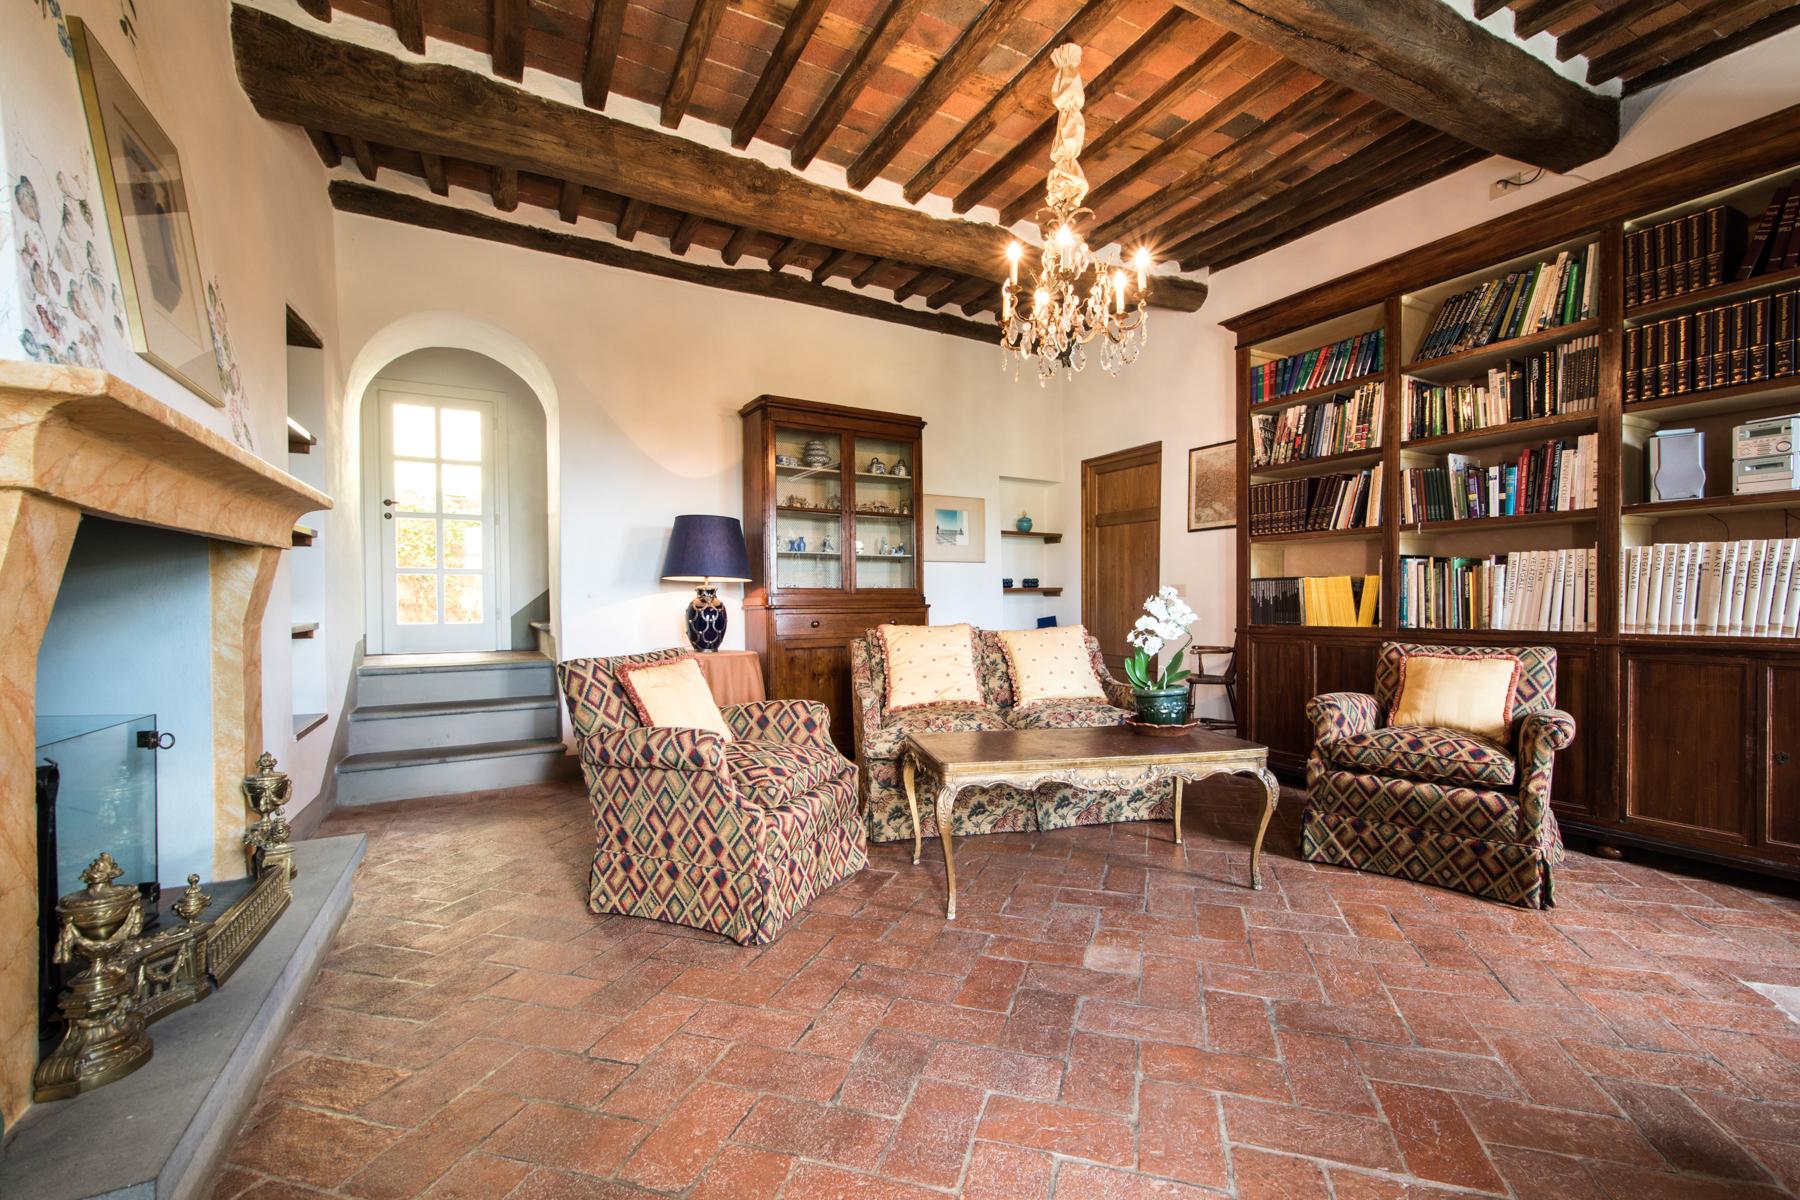 Villa in Vendita a Lucca: 5 locali, 1065 mq - Foto 20